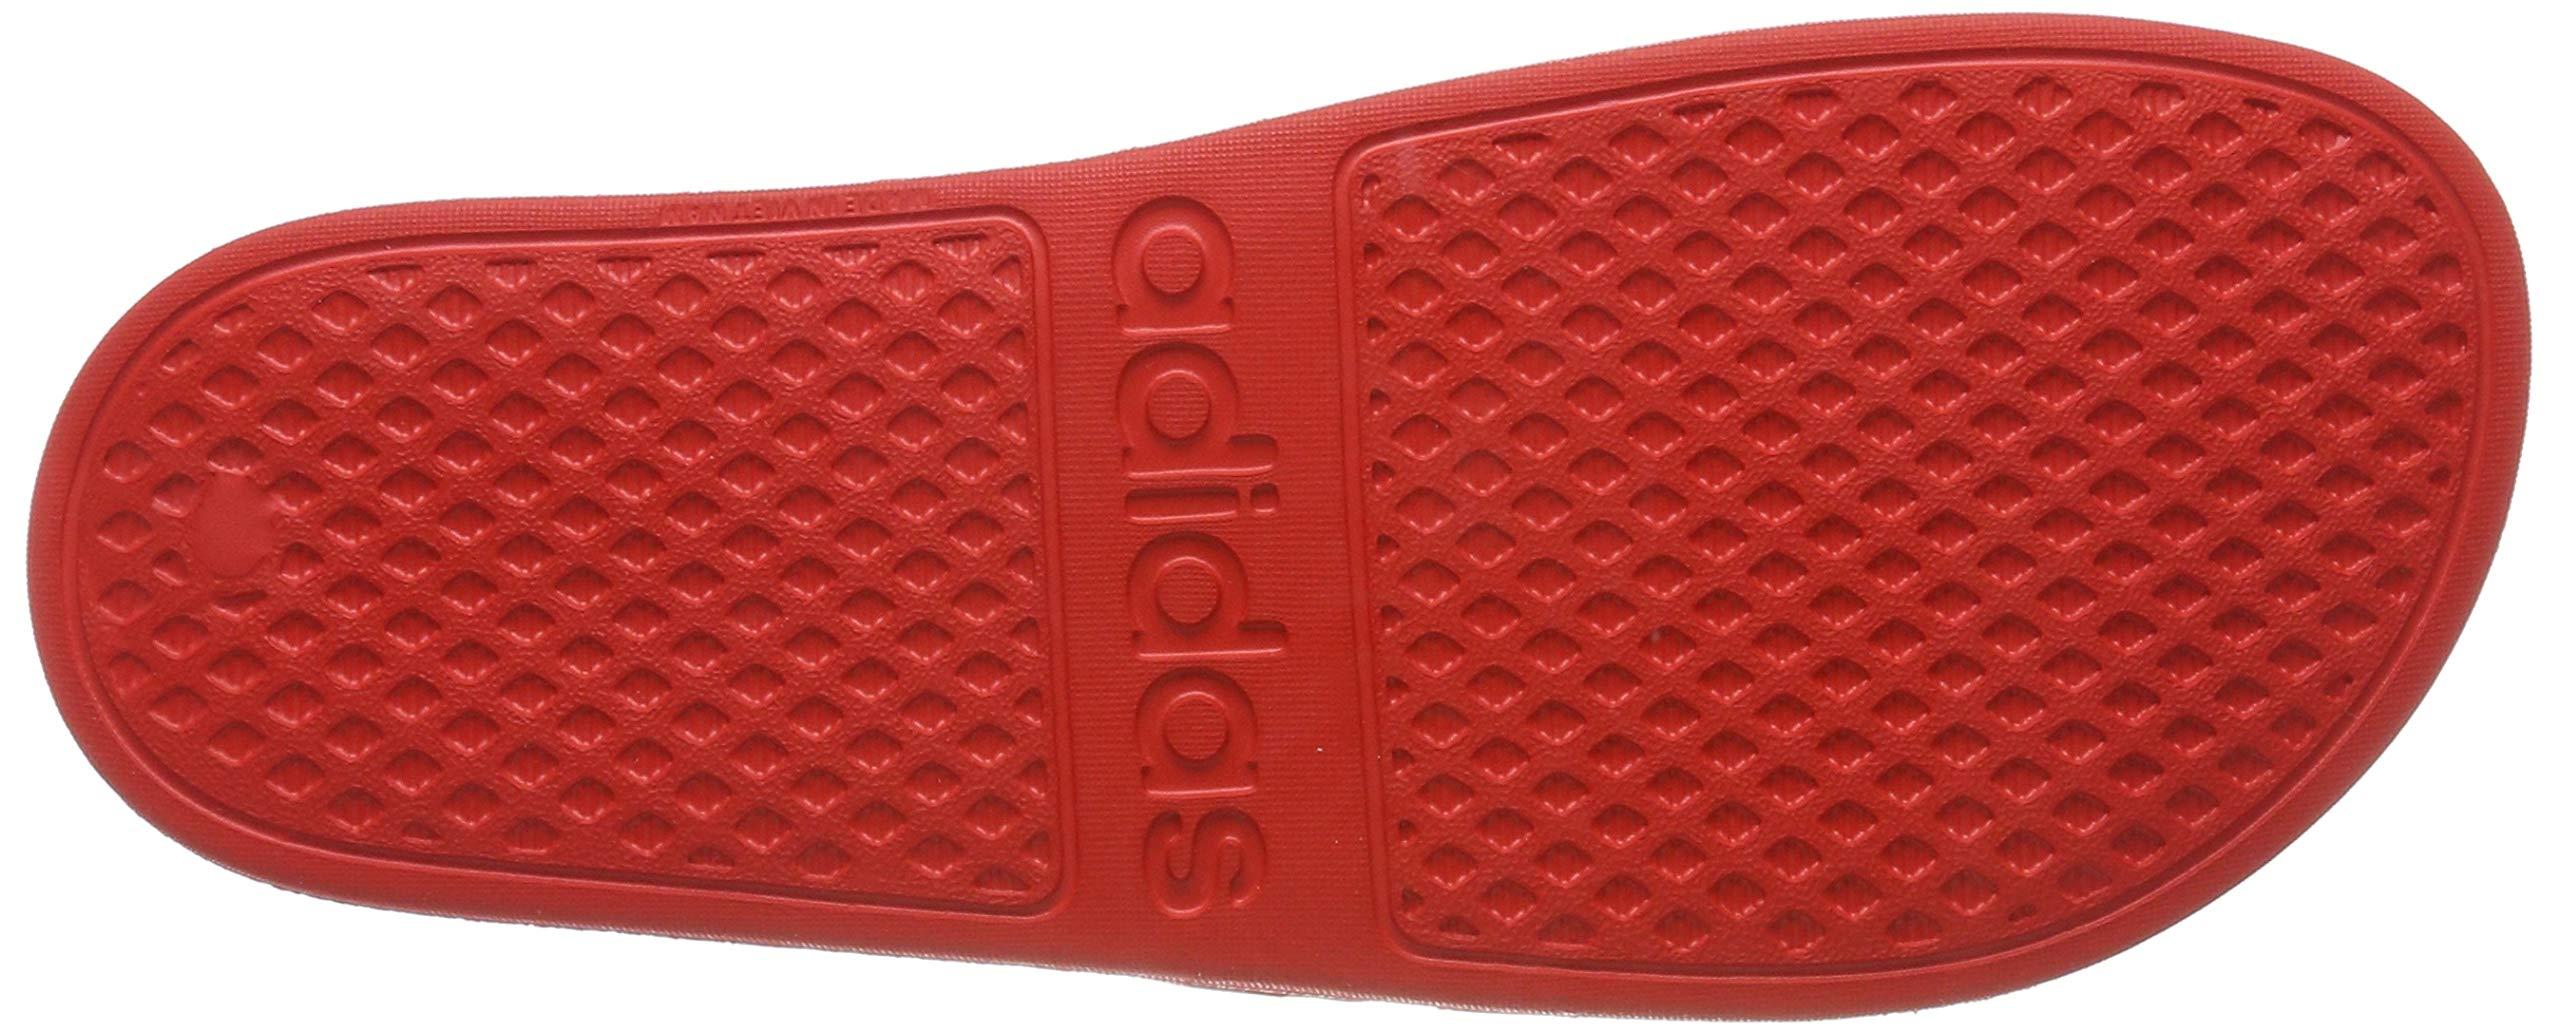 Adidas Adilette Aqua Scarpe da Spiaggia e Piscina Unisex - Adulto 3 spesavip